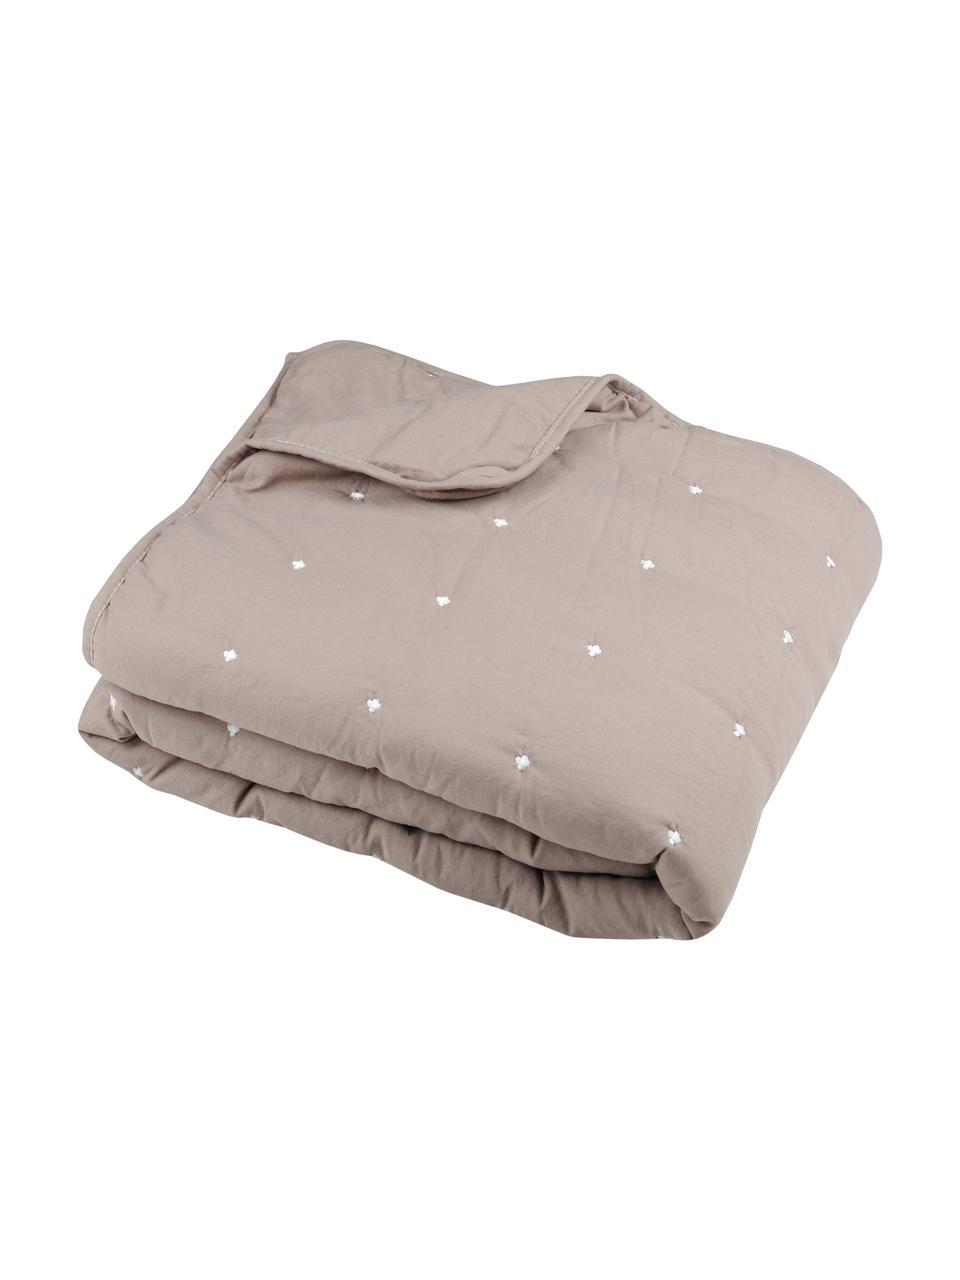 Narzuta Honorine, 100% poliester, Taupe, 220 x 240 cm (do łóżek od 160 x 200)